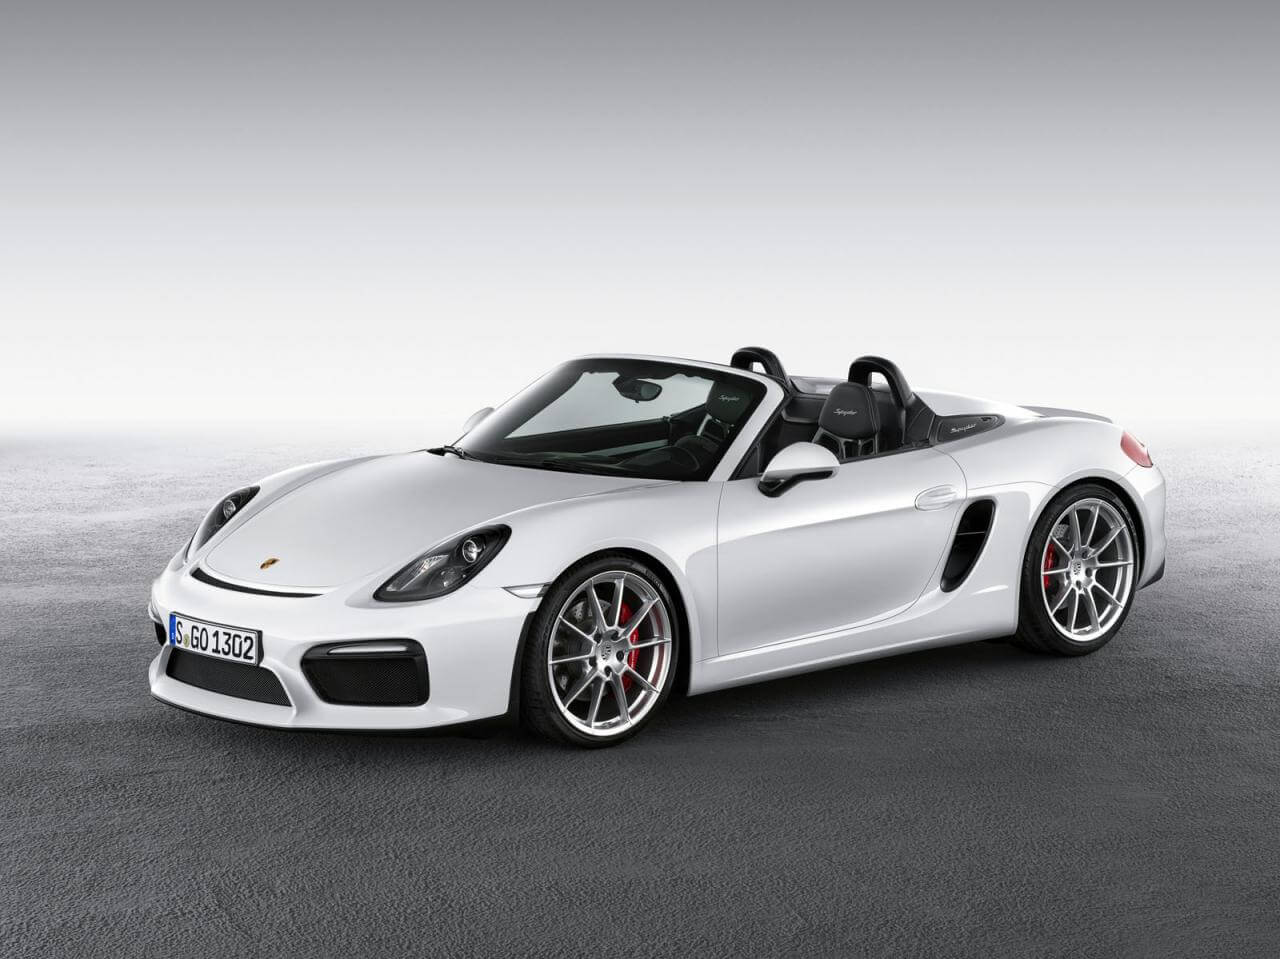 Porsche может выпустить Boxster Spyder GT4 и Cayman GT4 RS